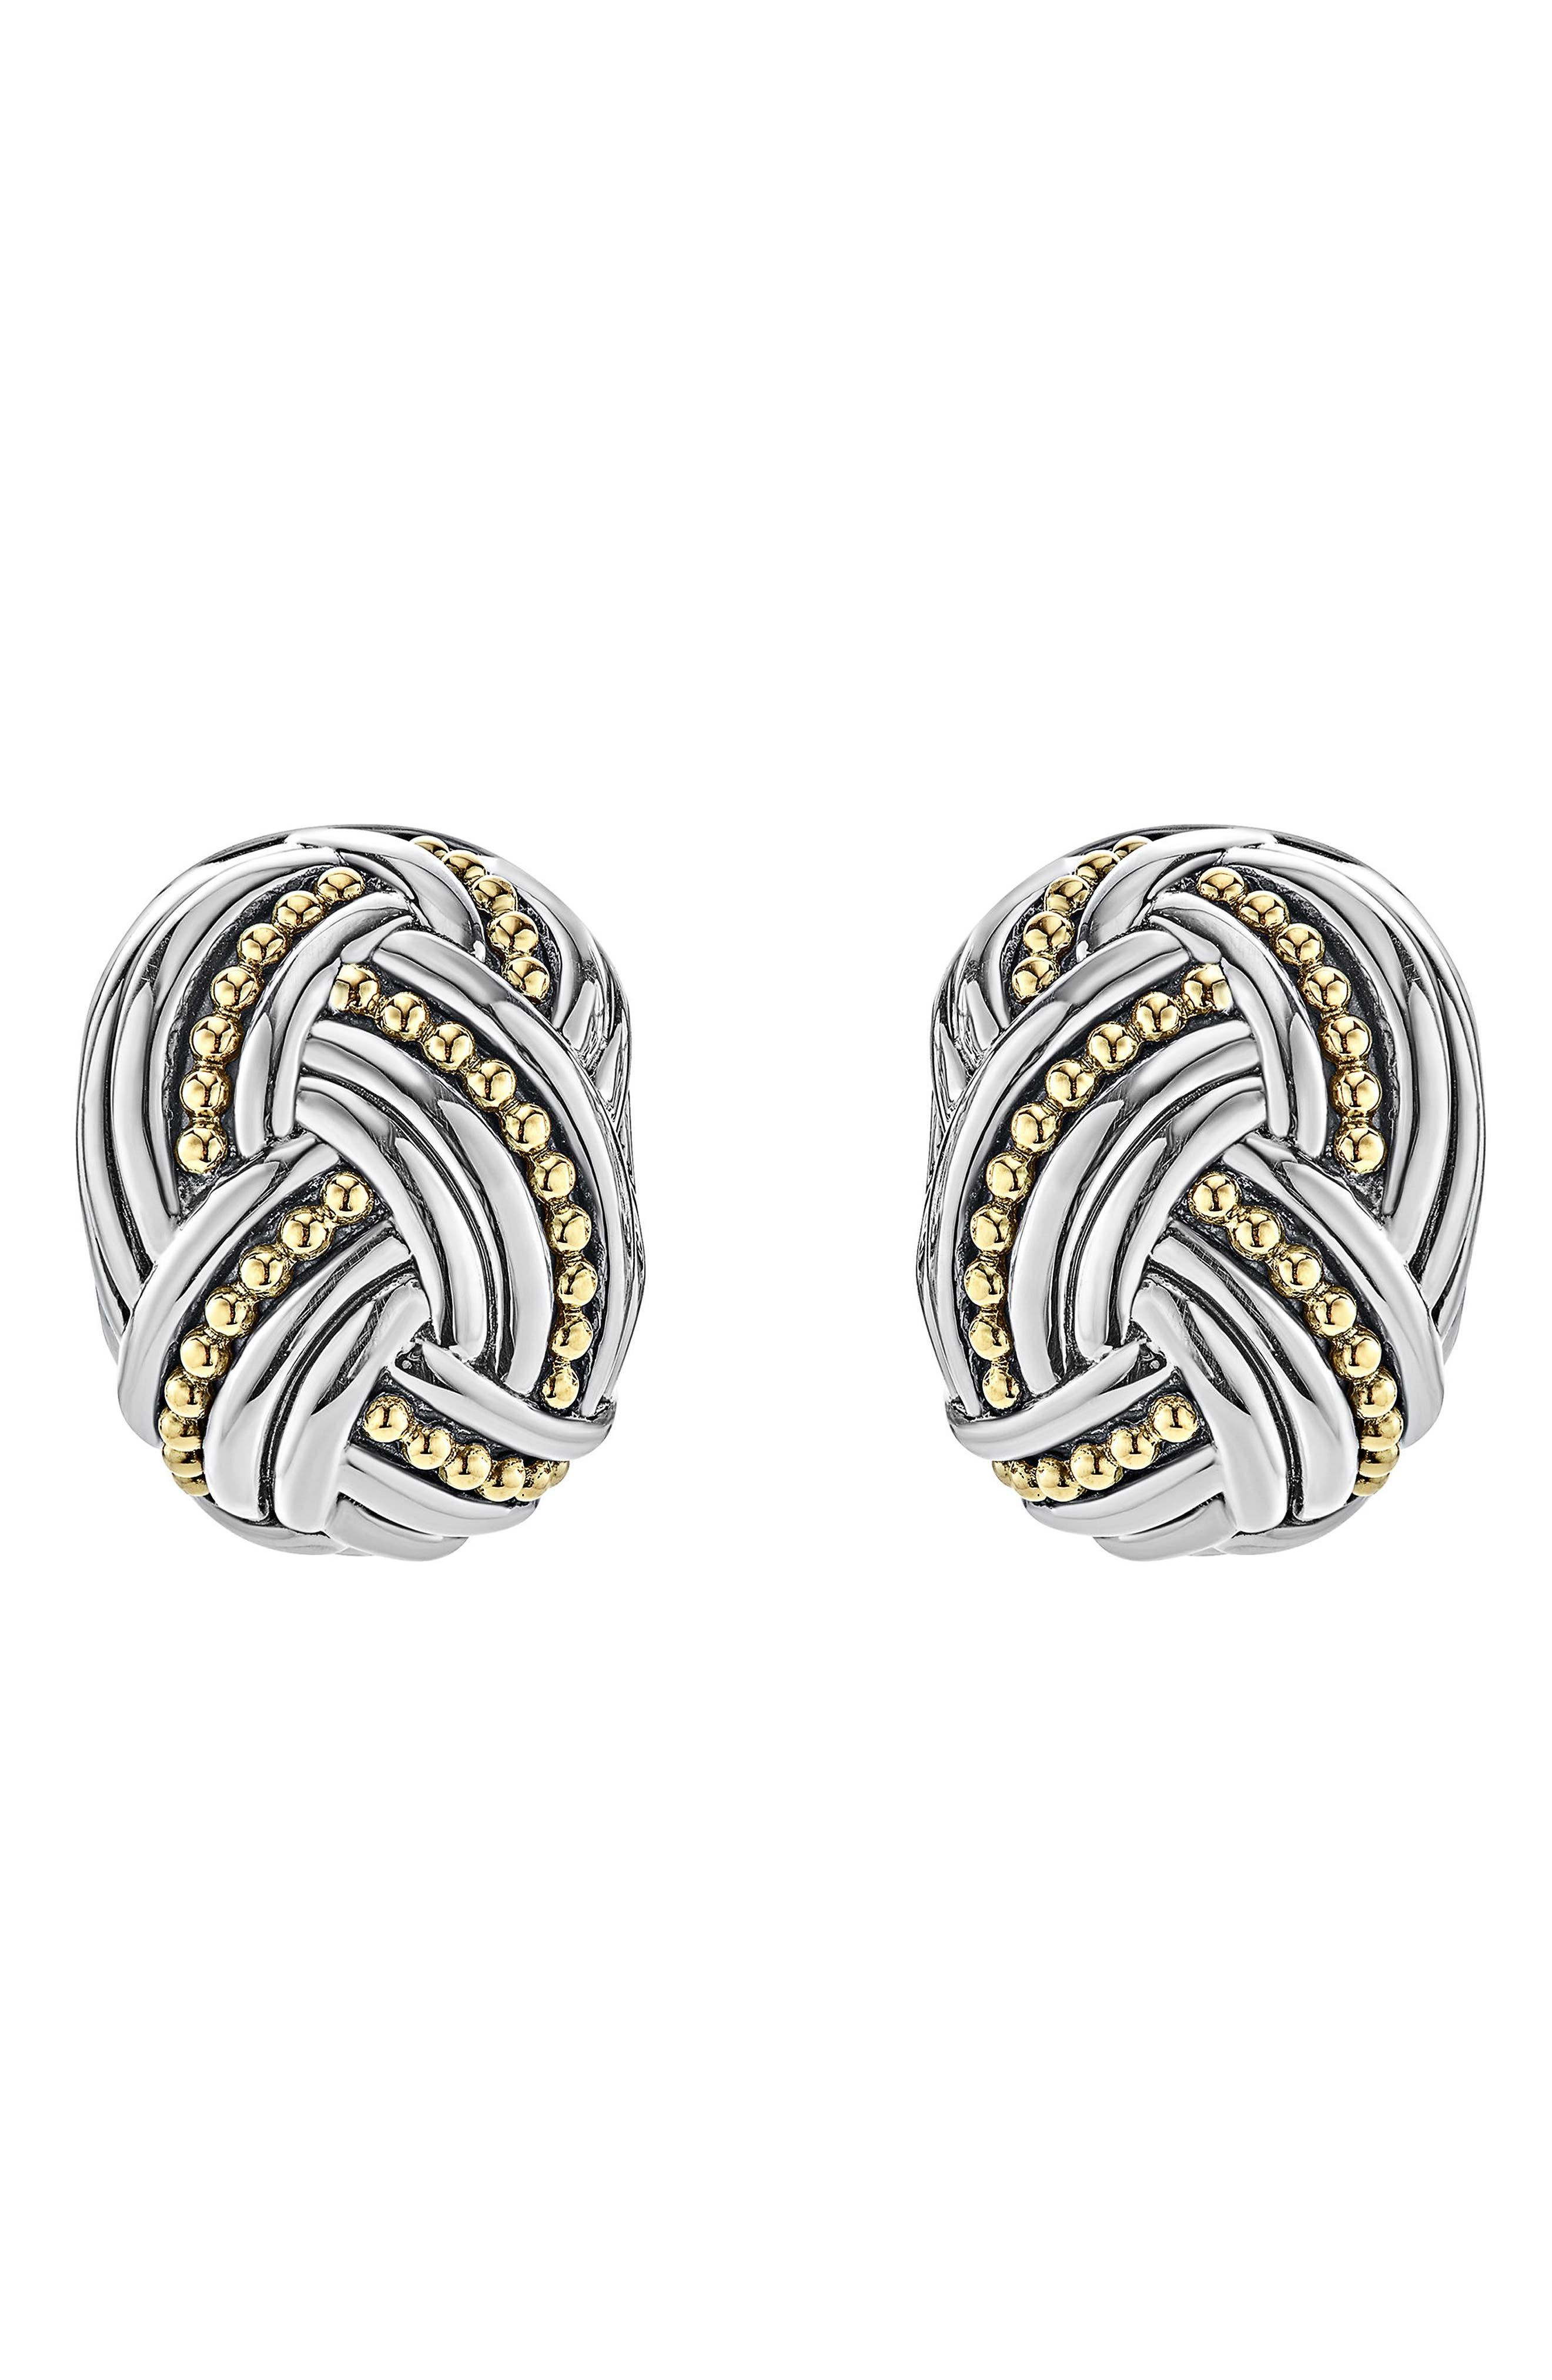 Torsade Rectangle Omega Clip Earrings,                             Main thumbnail 1, color,                             Silver/ Gold